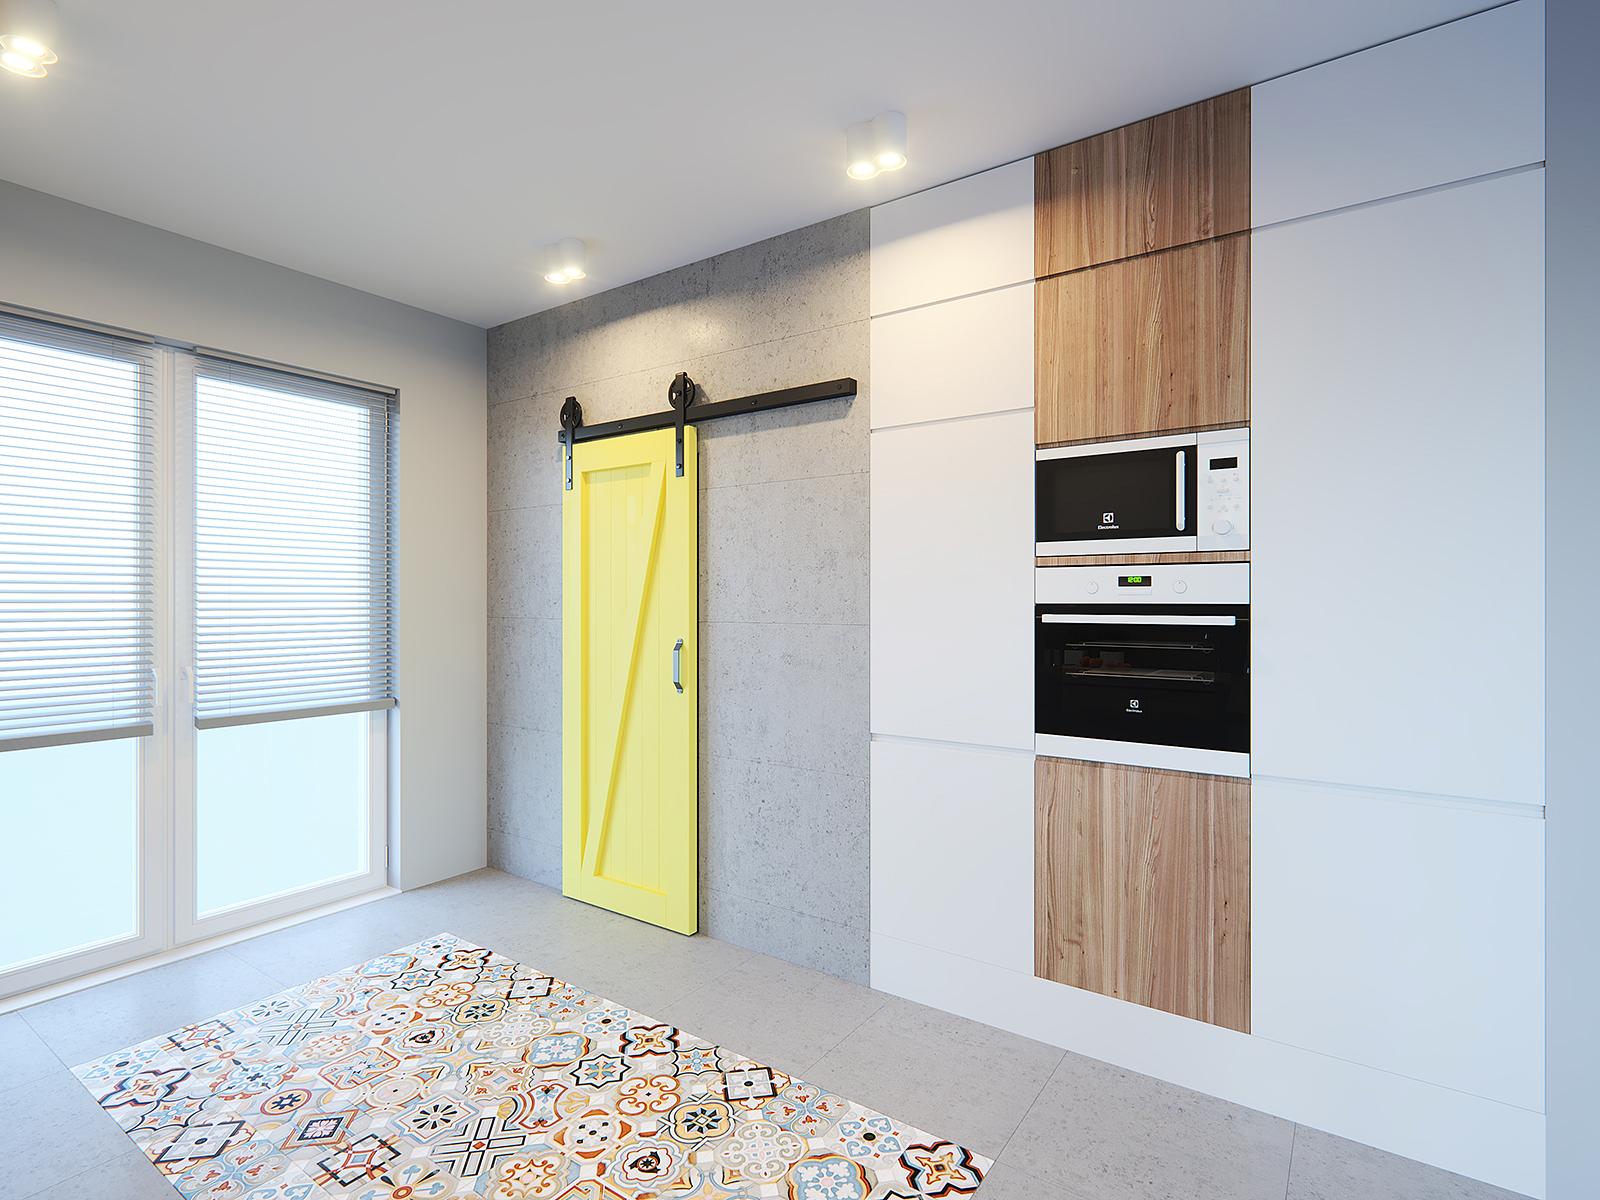 beton w kuchni białe meble